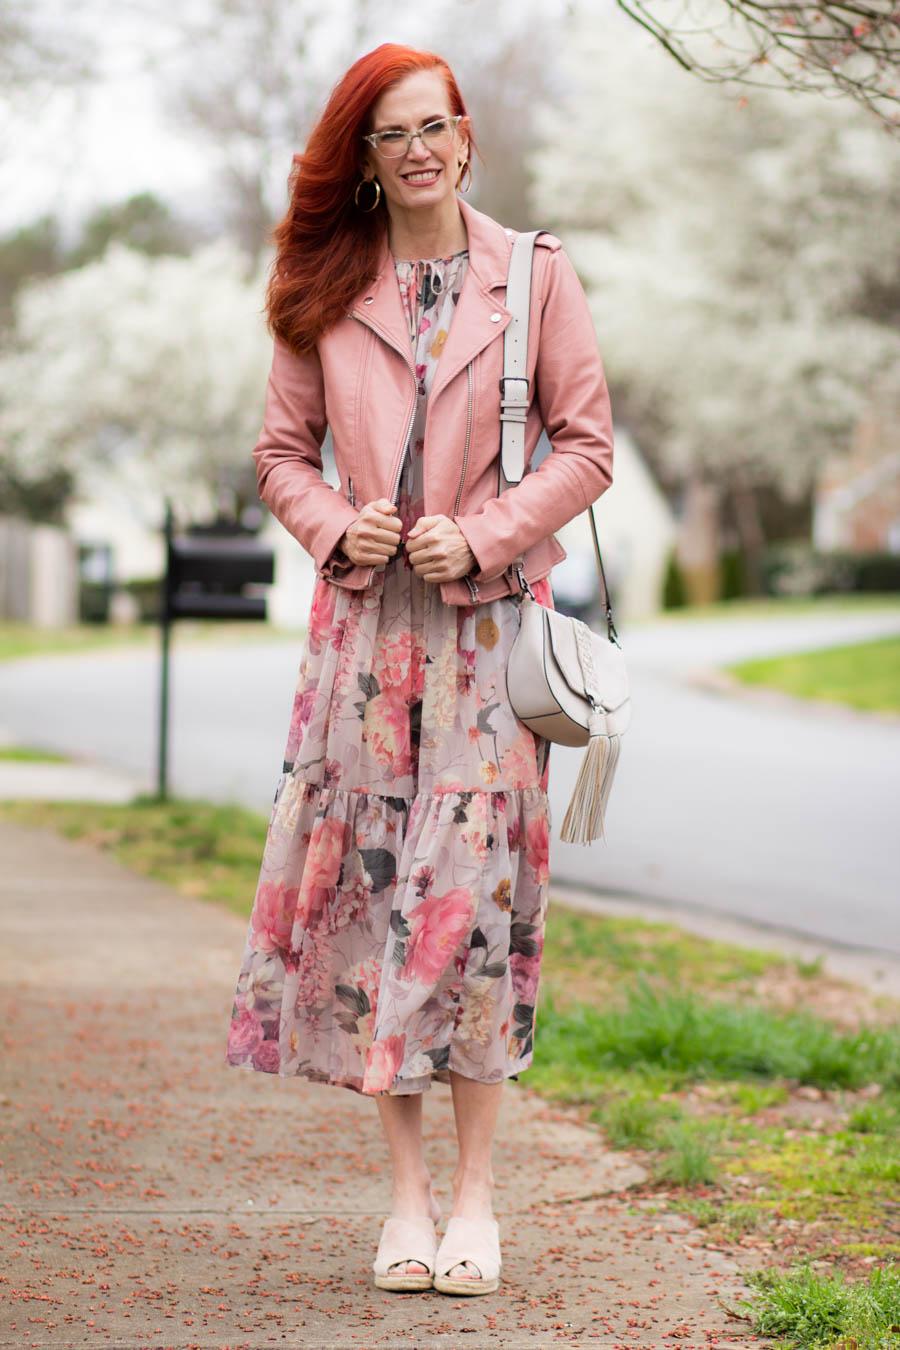 Floral midi dress for Spring